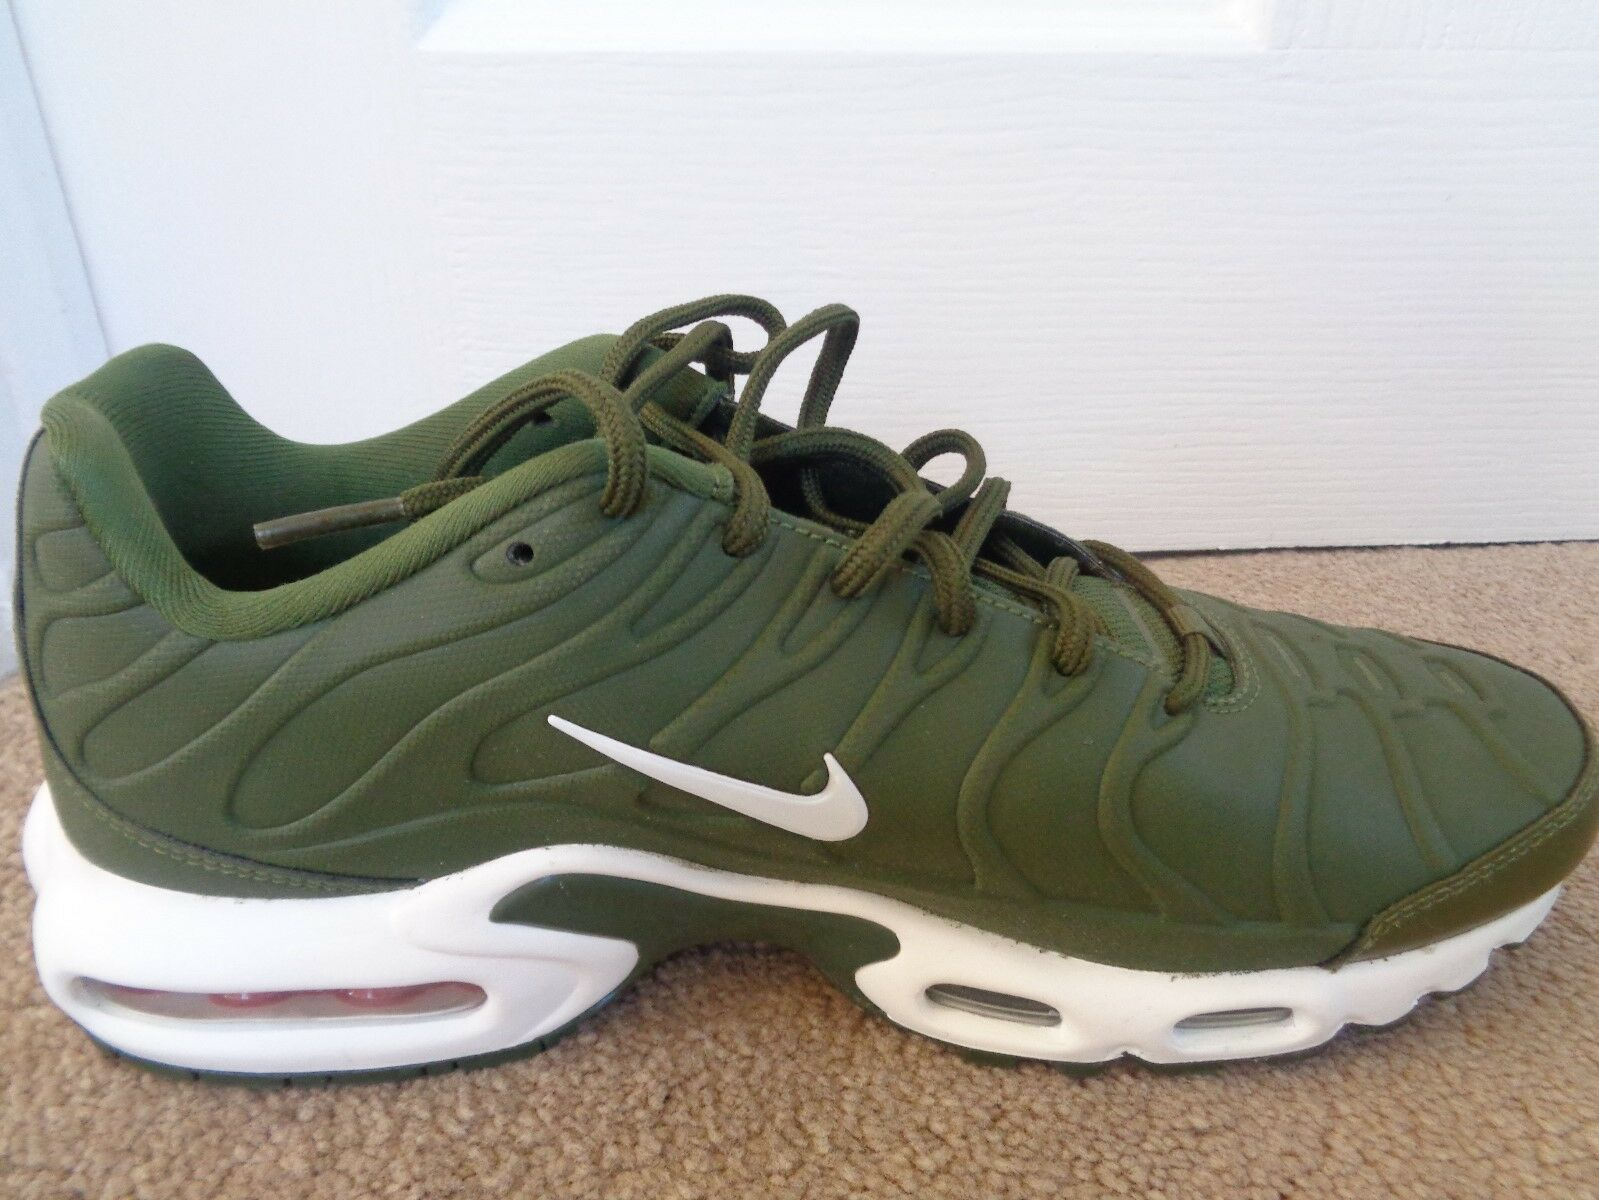 Nike air max plus vt ausbilder turnschuhe turnschuhe turnschuhe 505819 300 eu - 42 us - 8,5 neue + box 7be628